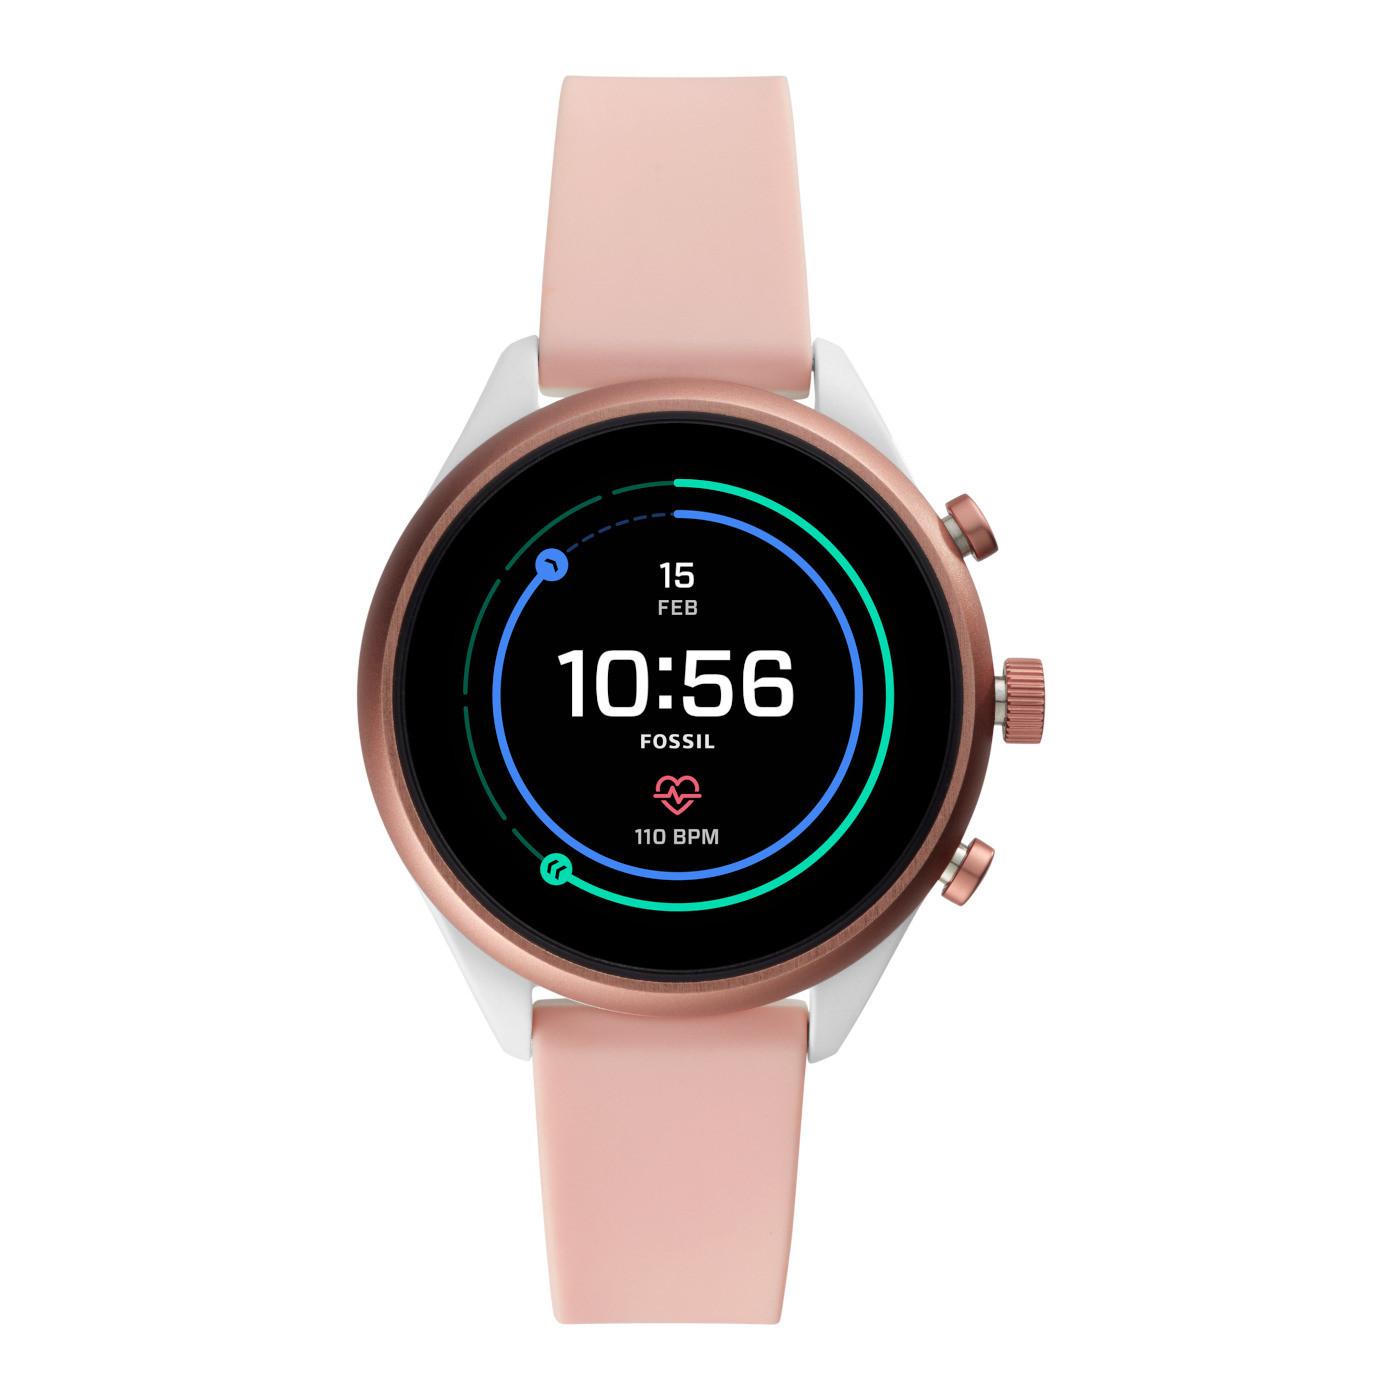 Fossil Sport  gen 4 (FTW6022) - Android Wear, NFC, GPS